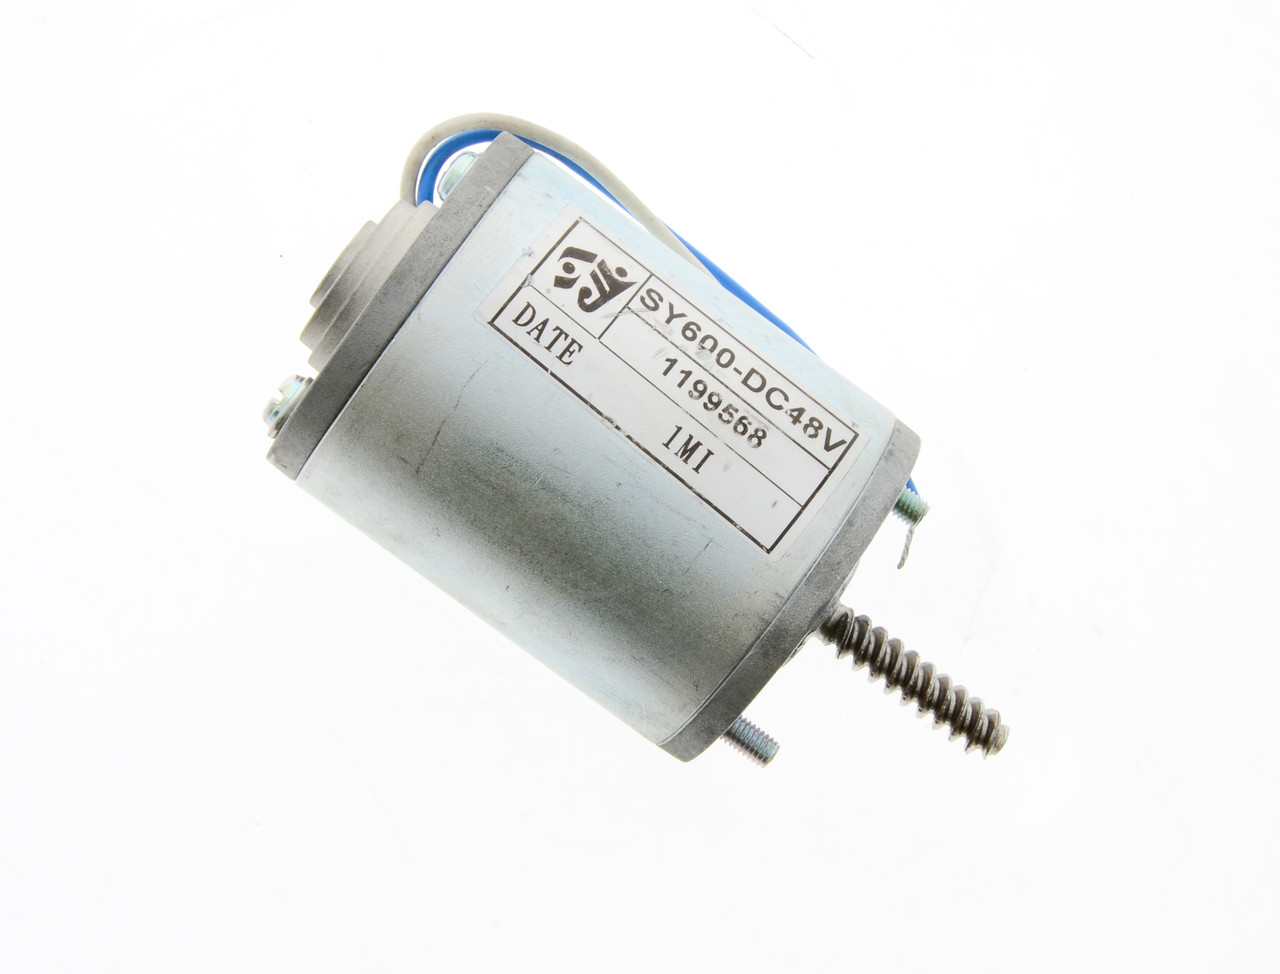 Gantry Motor for Prize Box (PBX-LEA-175)